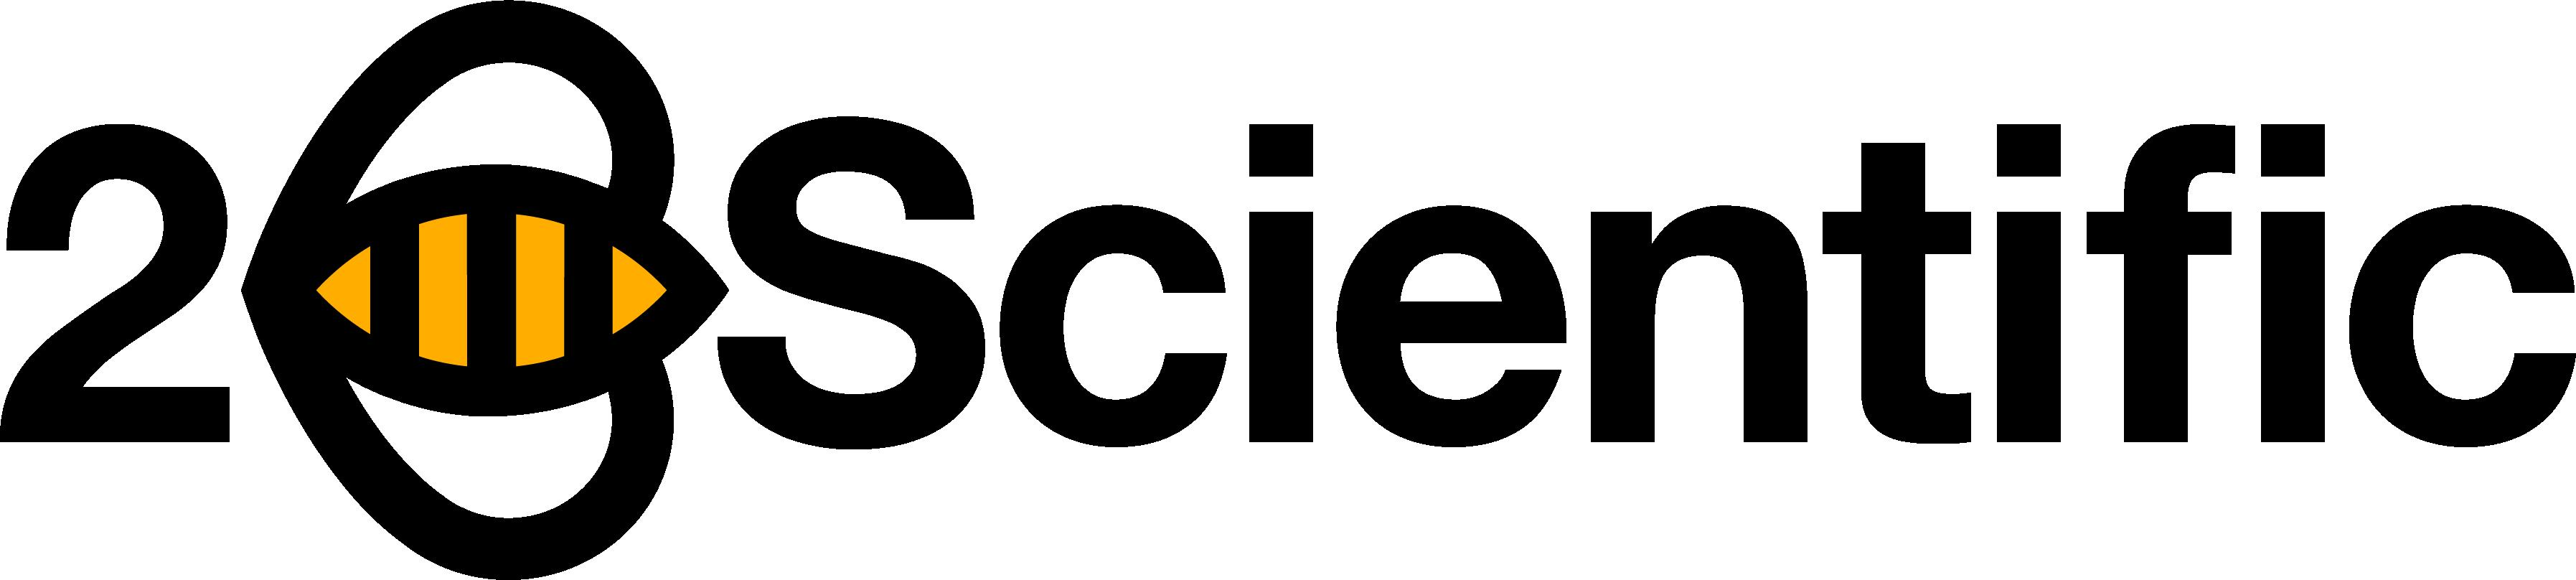 2bScientific Logo